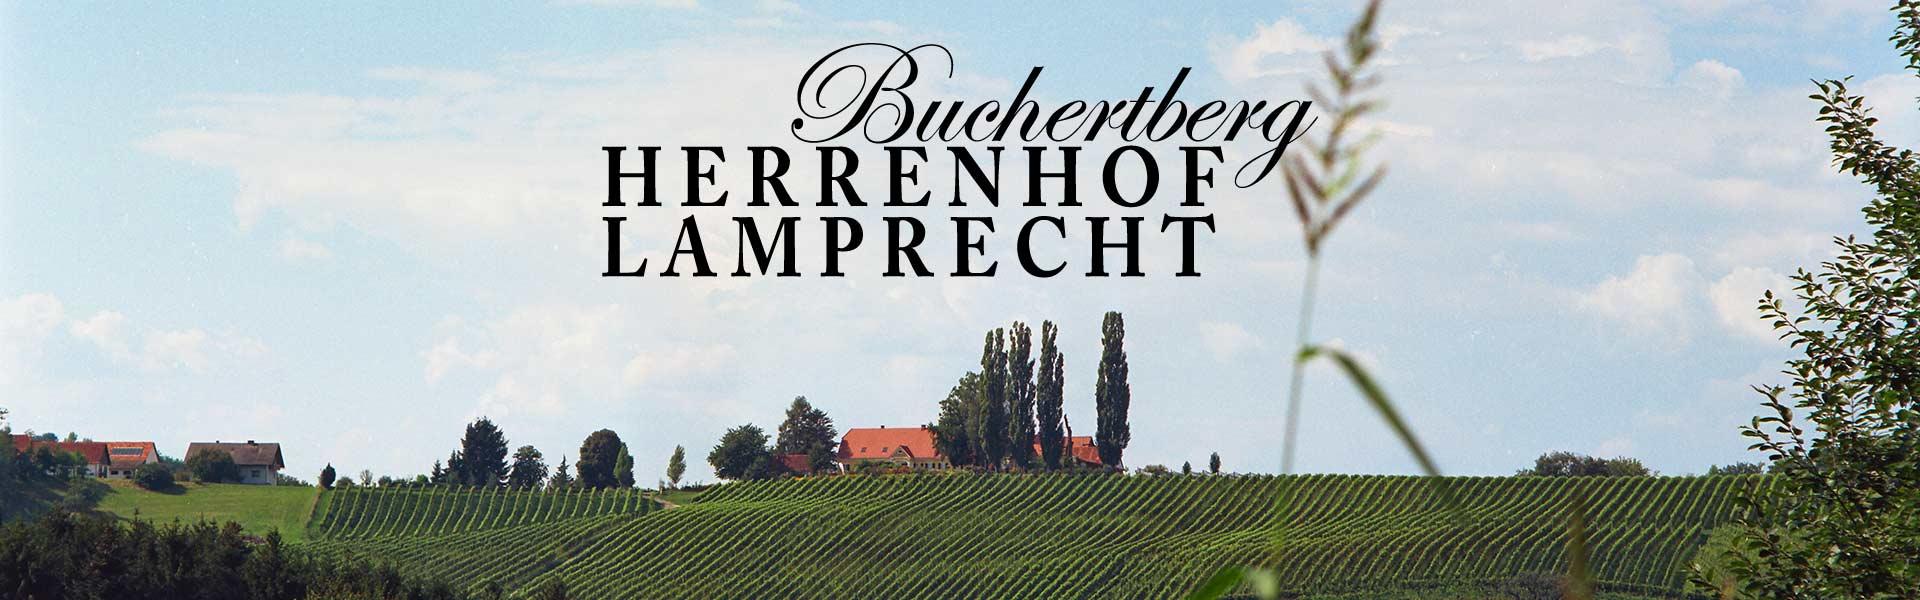 Der Buchertberg - Herrenhof Lamprecht